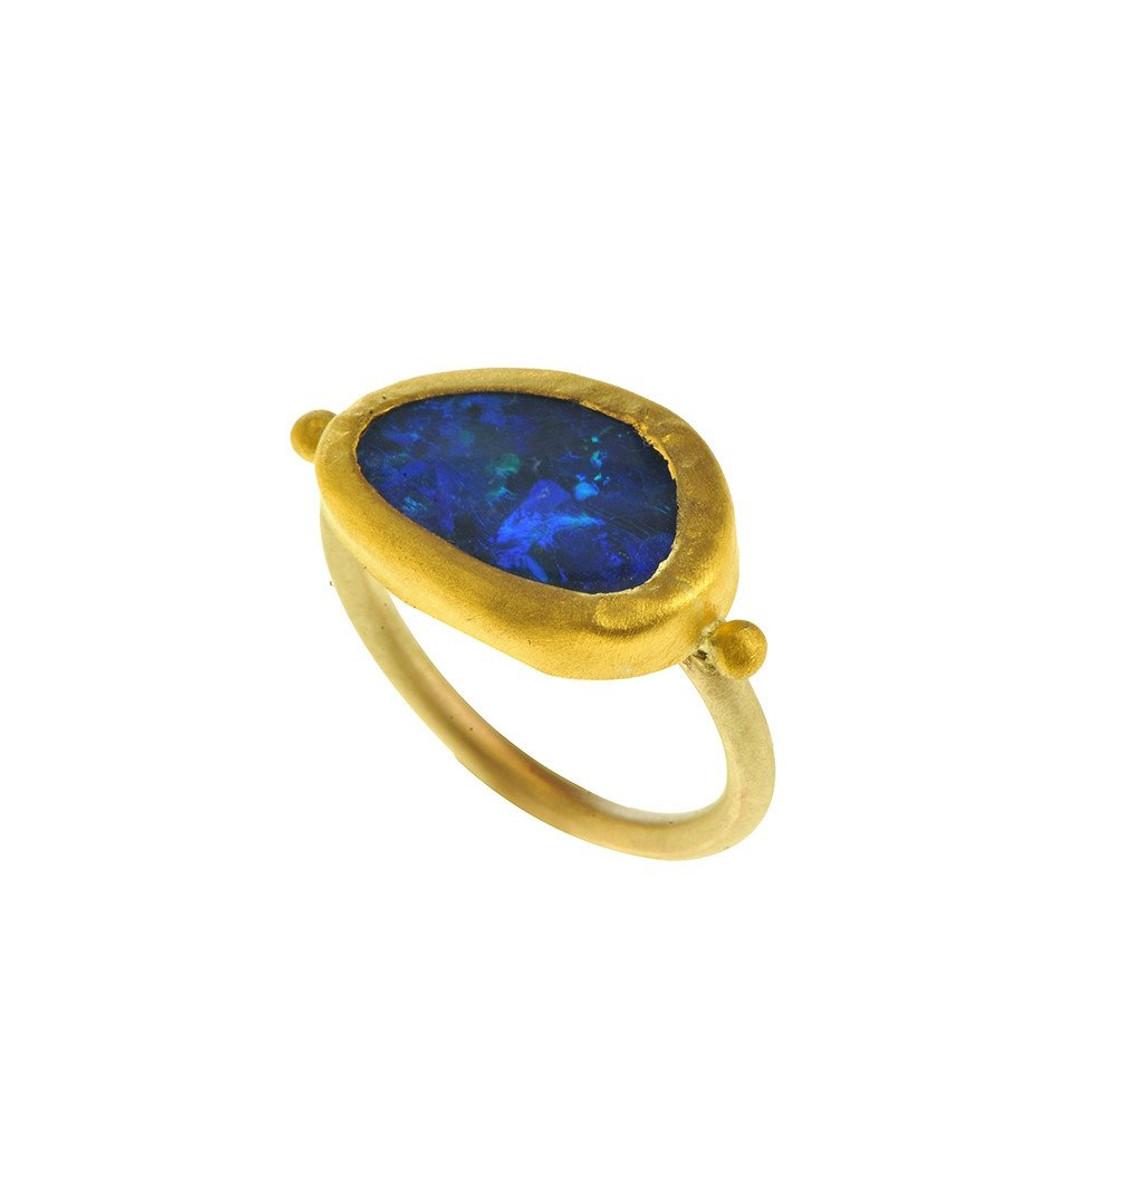 Brilliant Gold Opal Rin by Nava Zahavi - New Arrival